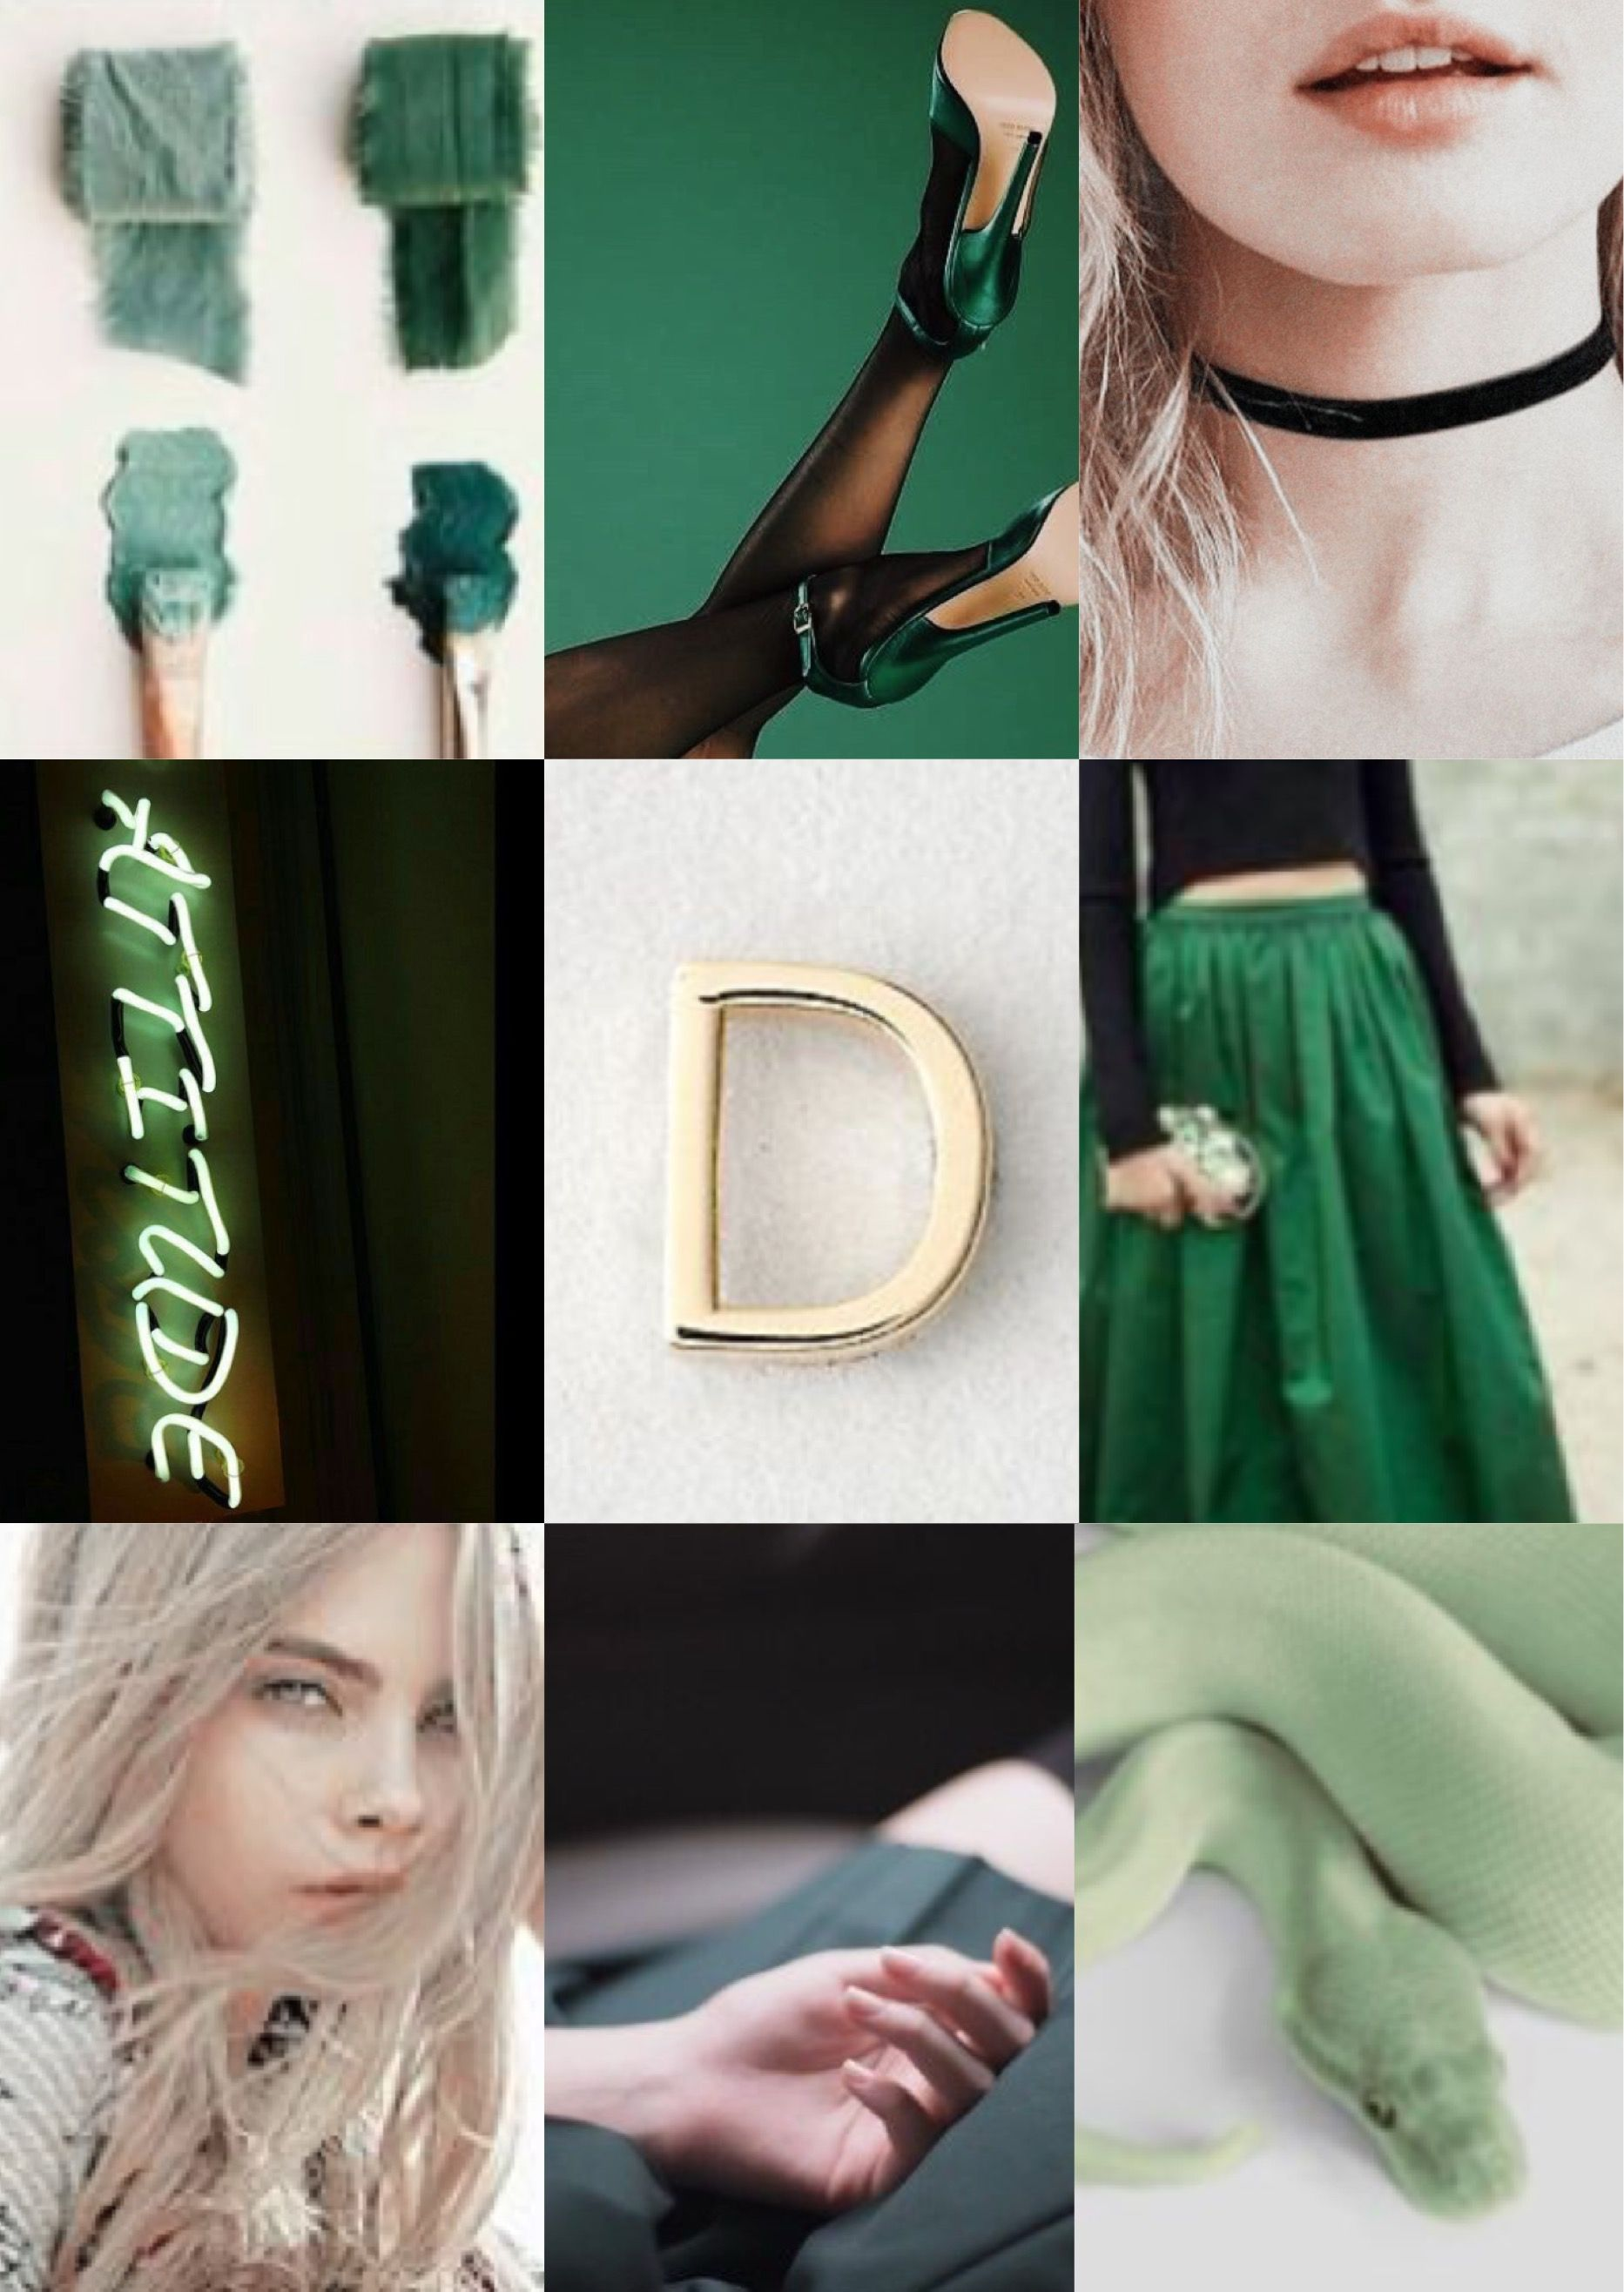 Daphne Greengrass Aesthetic Inspiration Harry Potter Slytherin Slytherin Fashion Harry Potter World Daphne